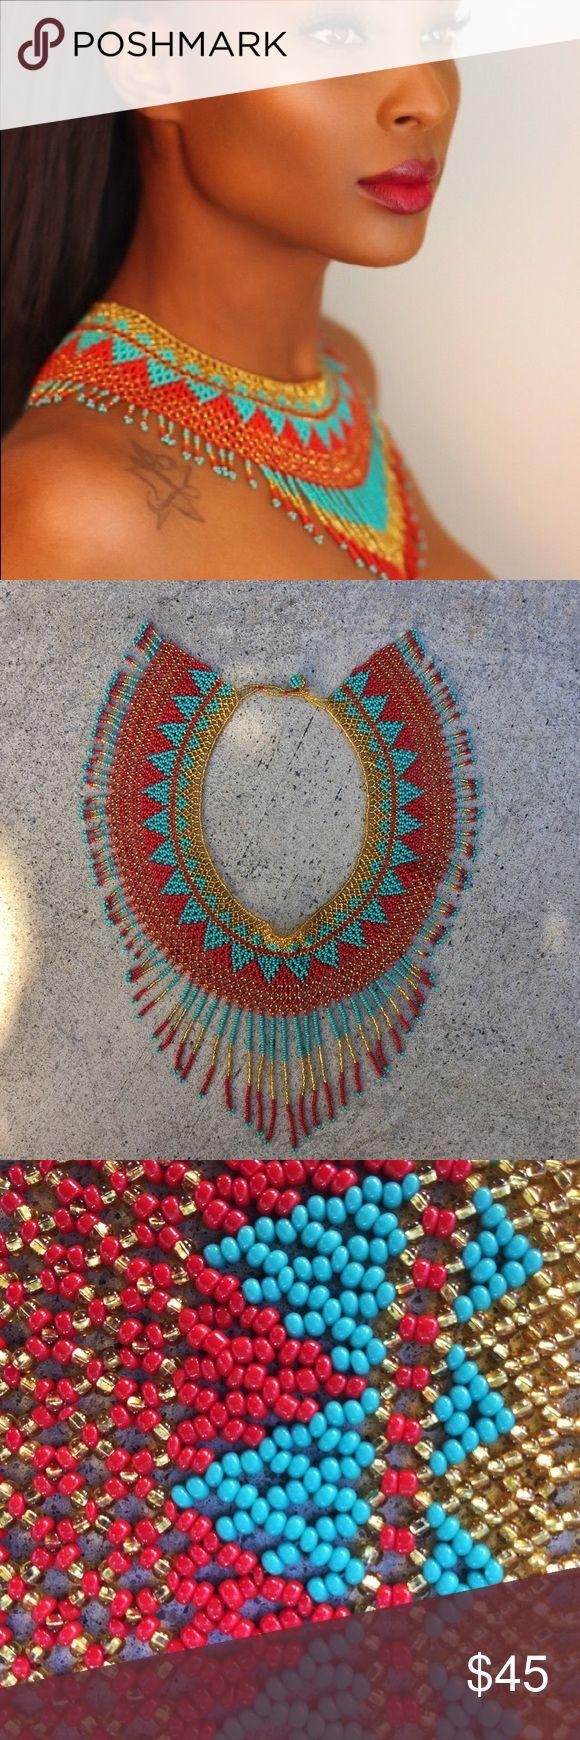 Handmade Beaded Necklace | Panama #Kuna Colorful handmade necklace bought in Casco Viejo, Panama 🇵🇦 Kuna Indian beaded neckwear | Lightly used for photo shoot! Jewelry Necklaces